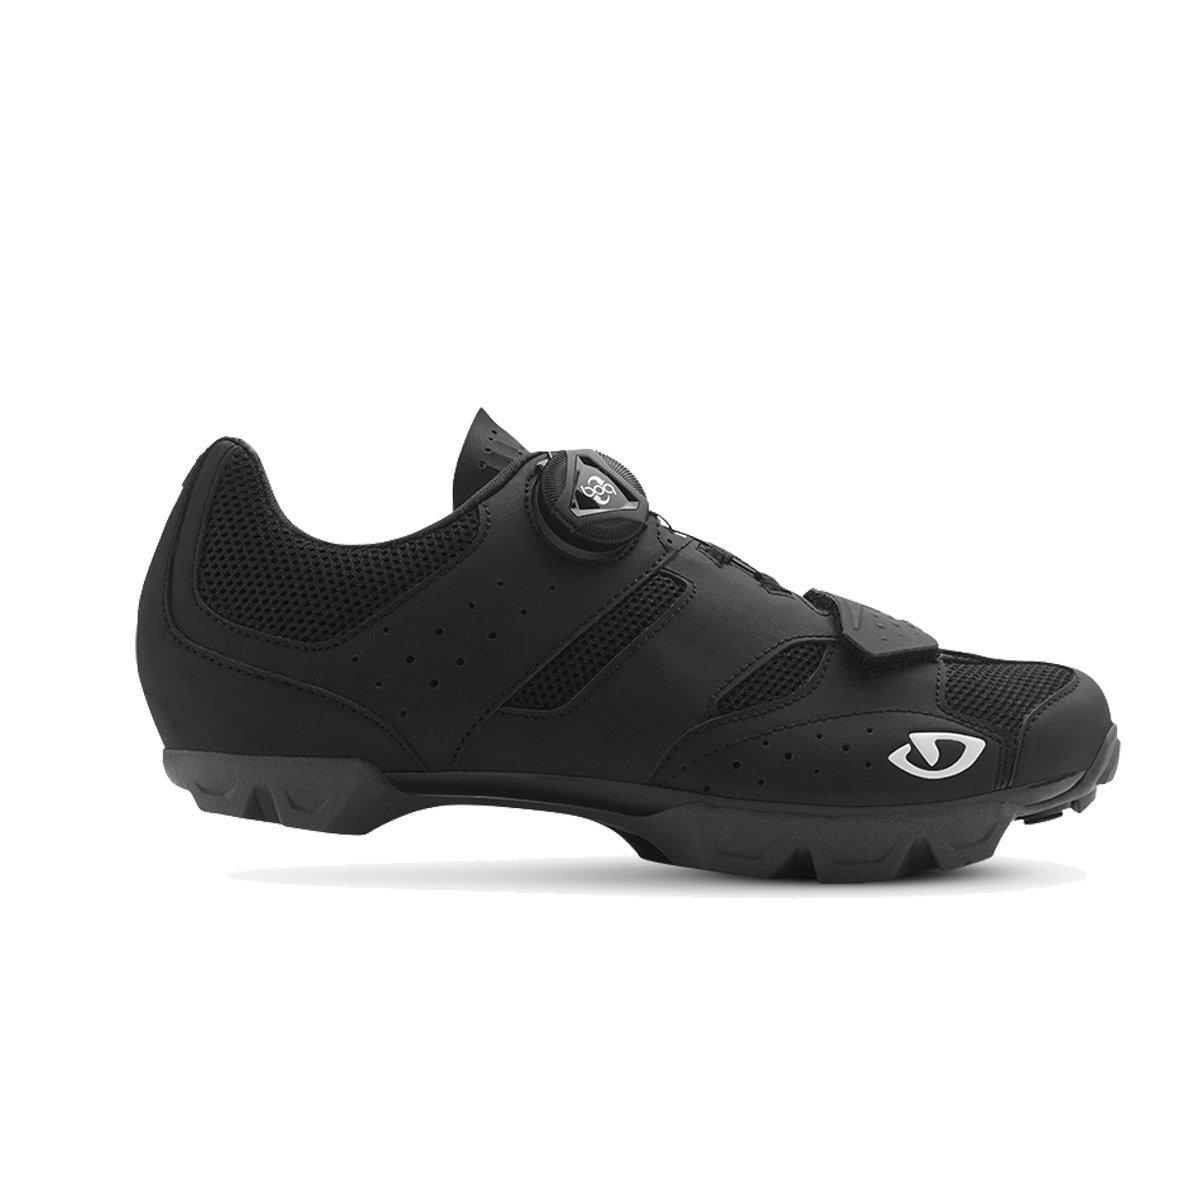 Womens Giro Cylinder Cycling Shoes